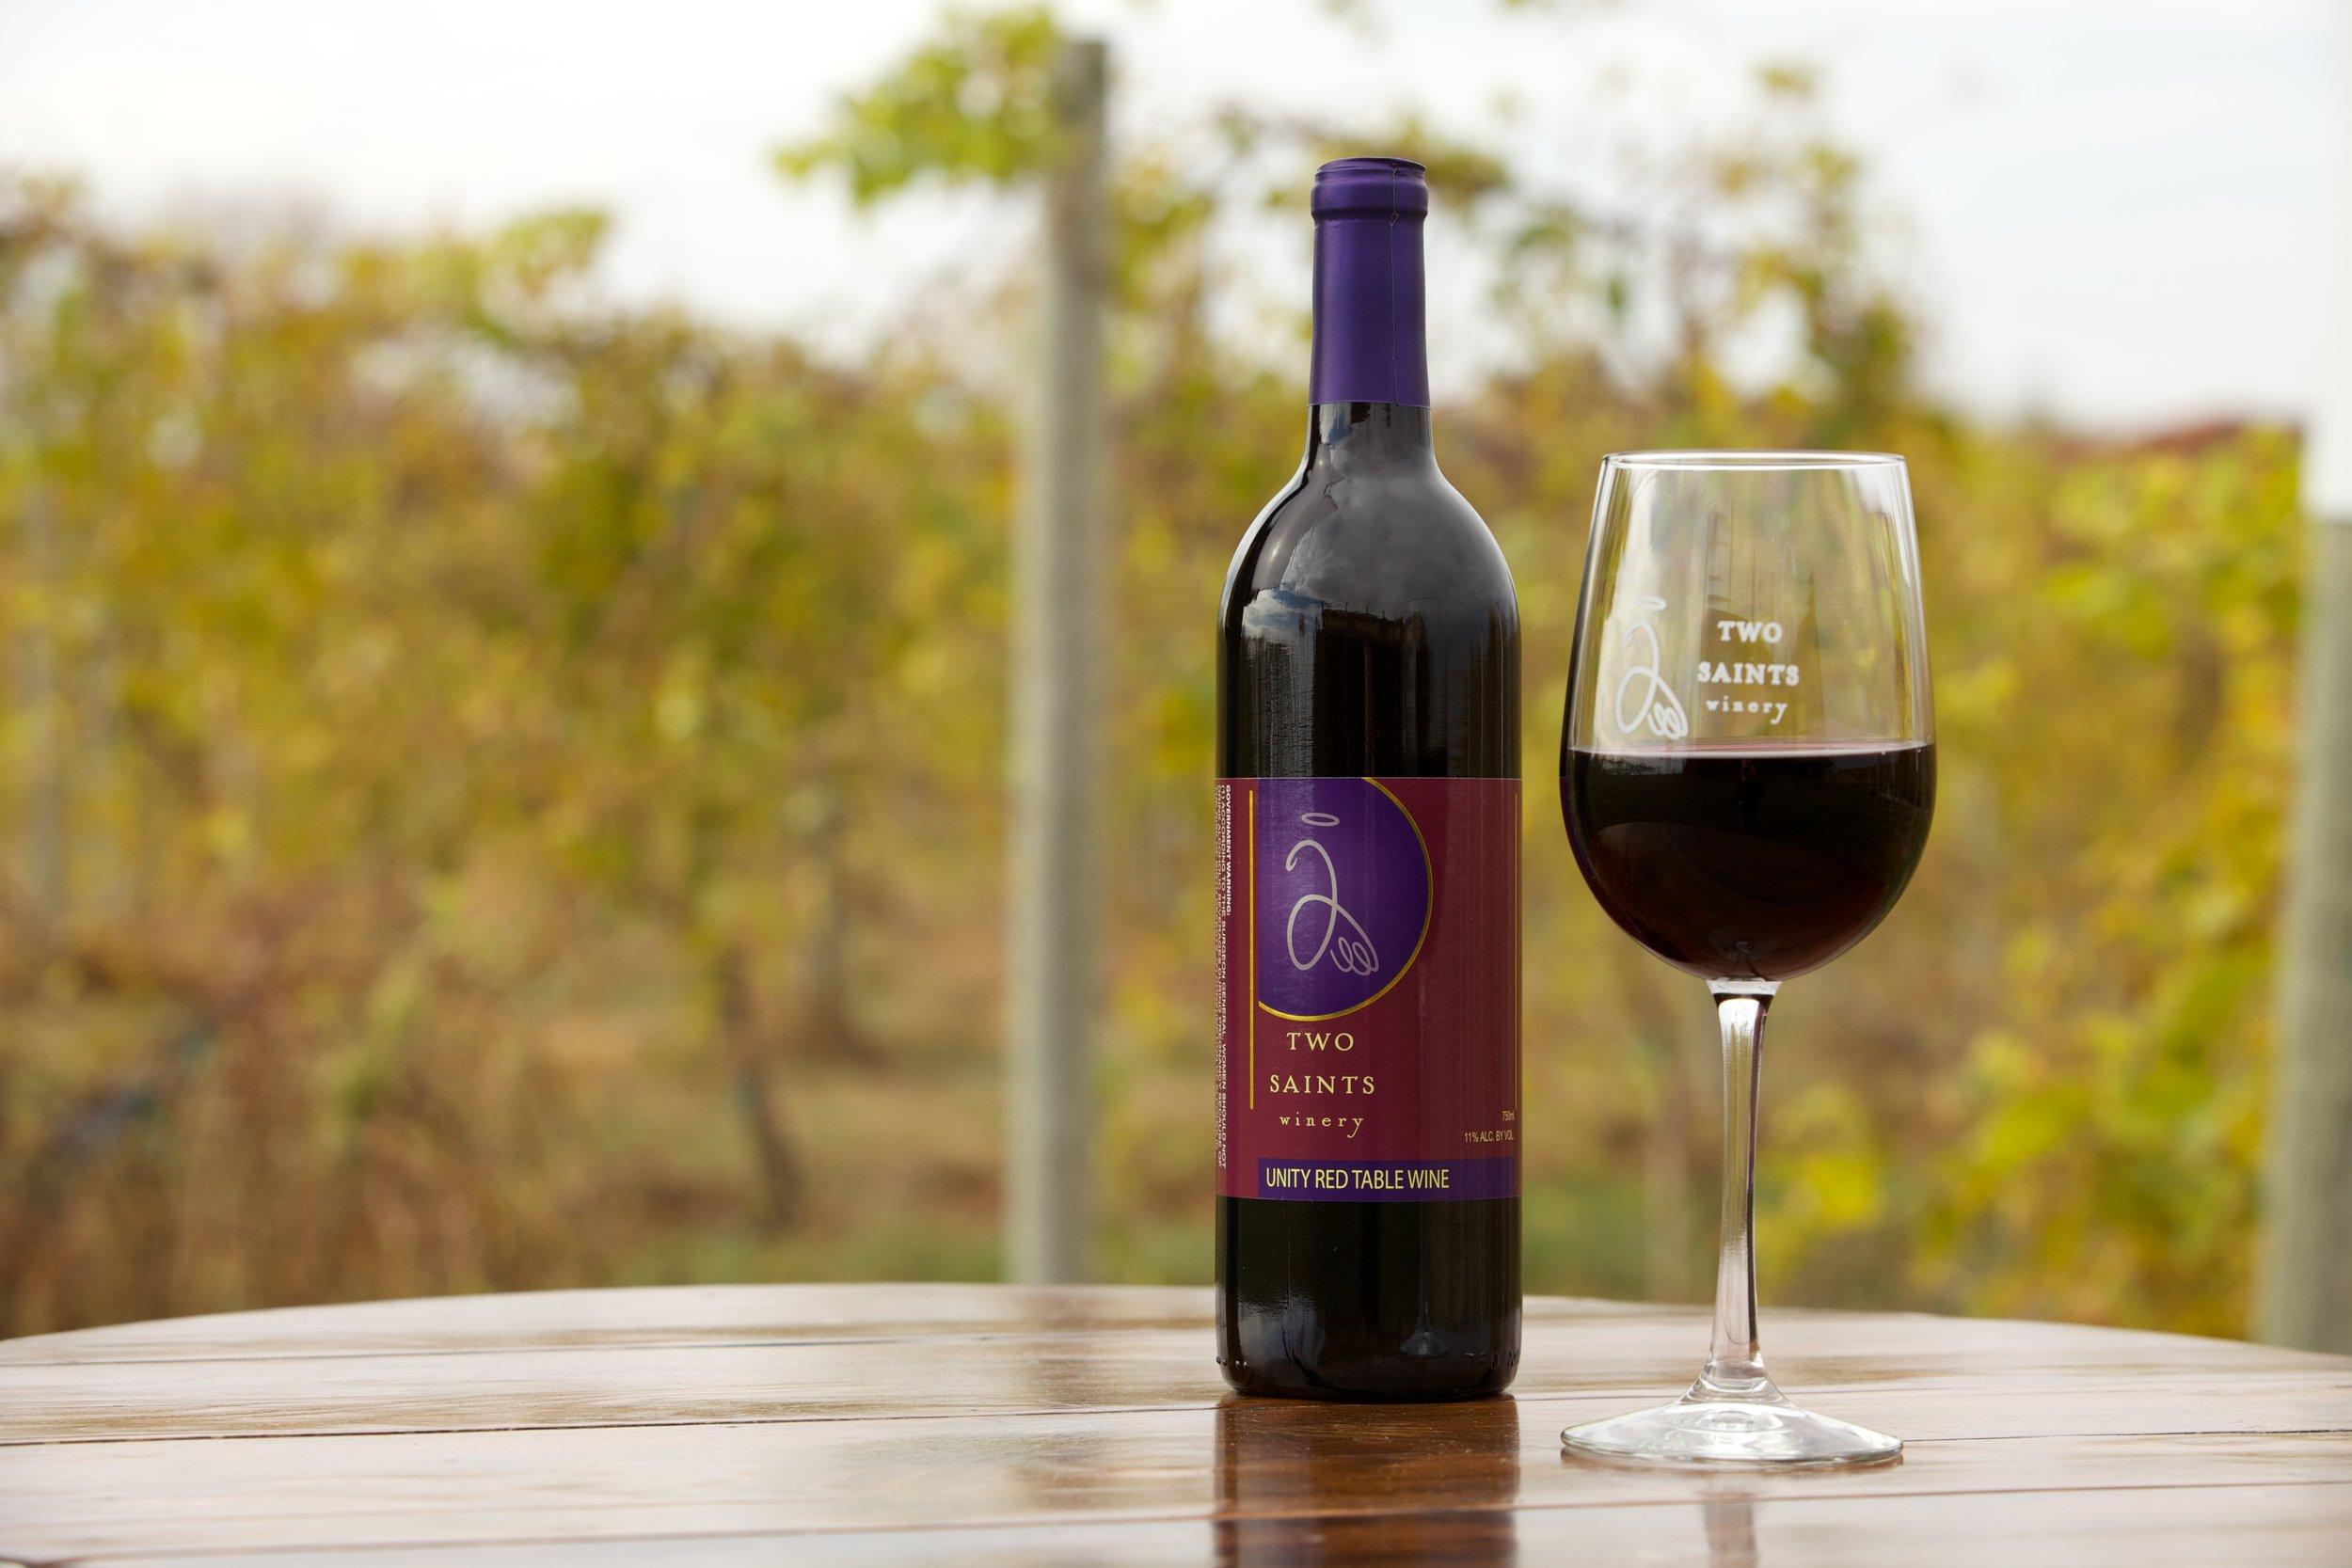 11o_2Saints_038_JPir (2)ia wine 014.jpg